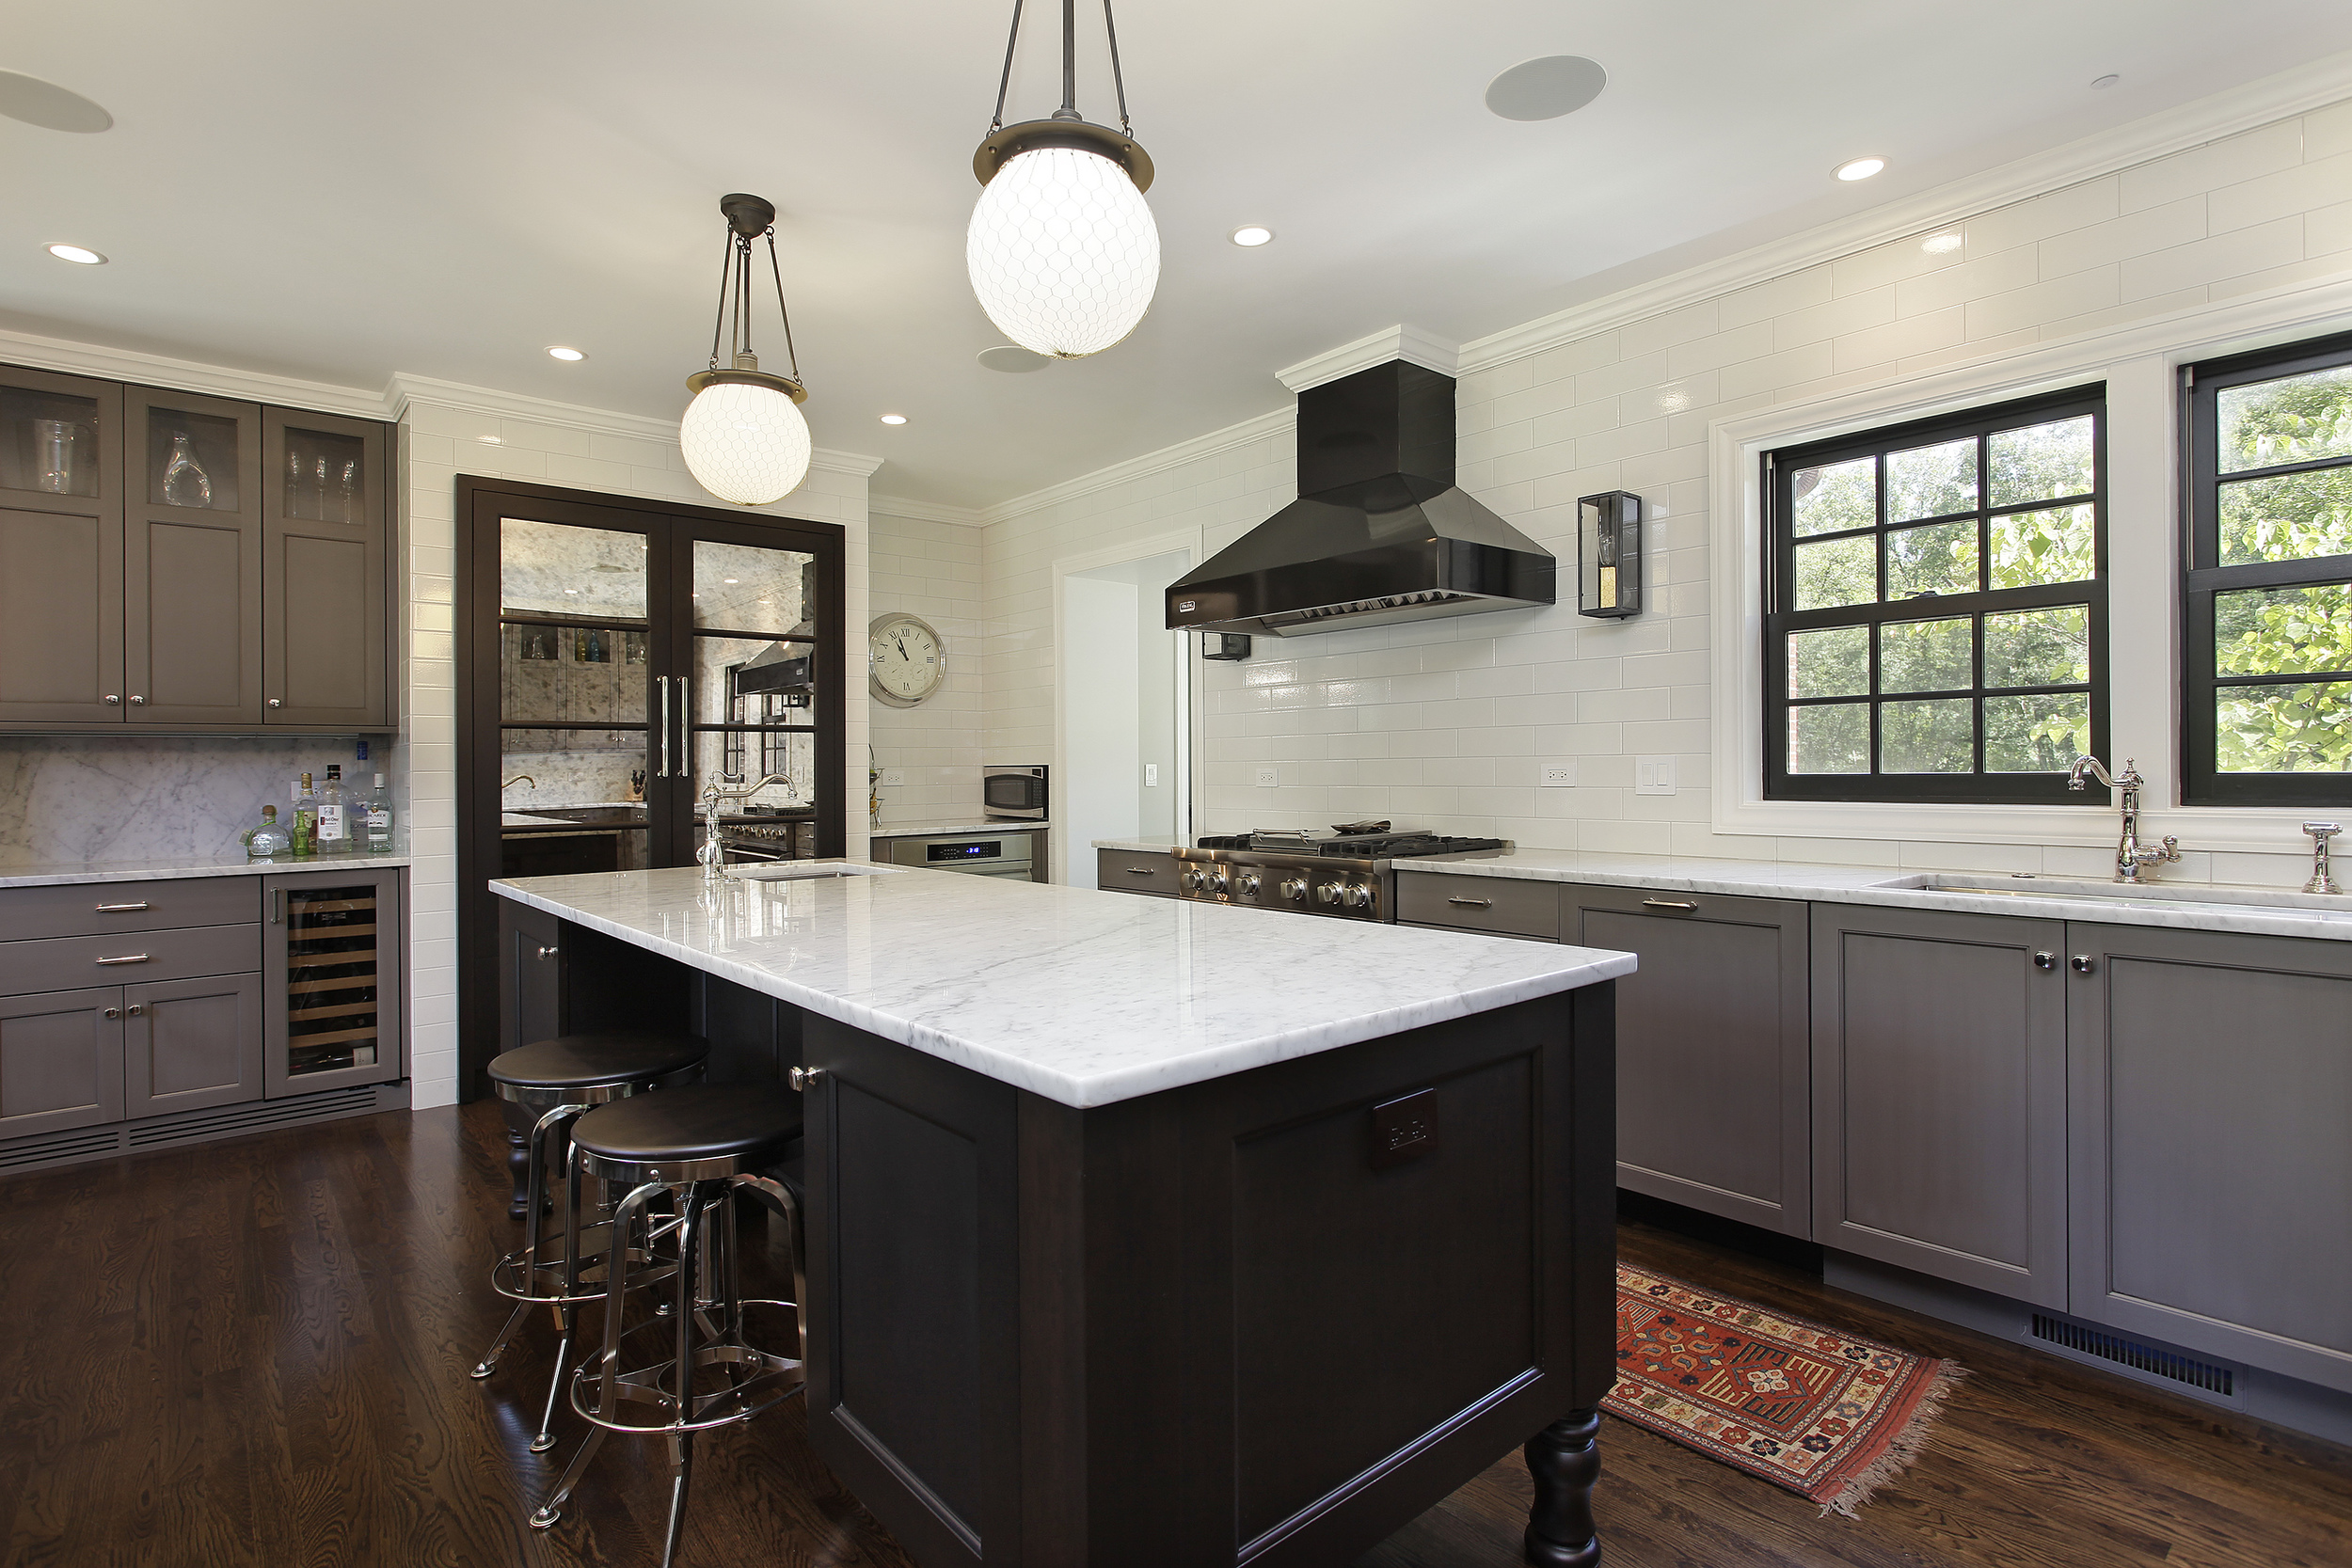 kitchen1_1730ridge.JPG